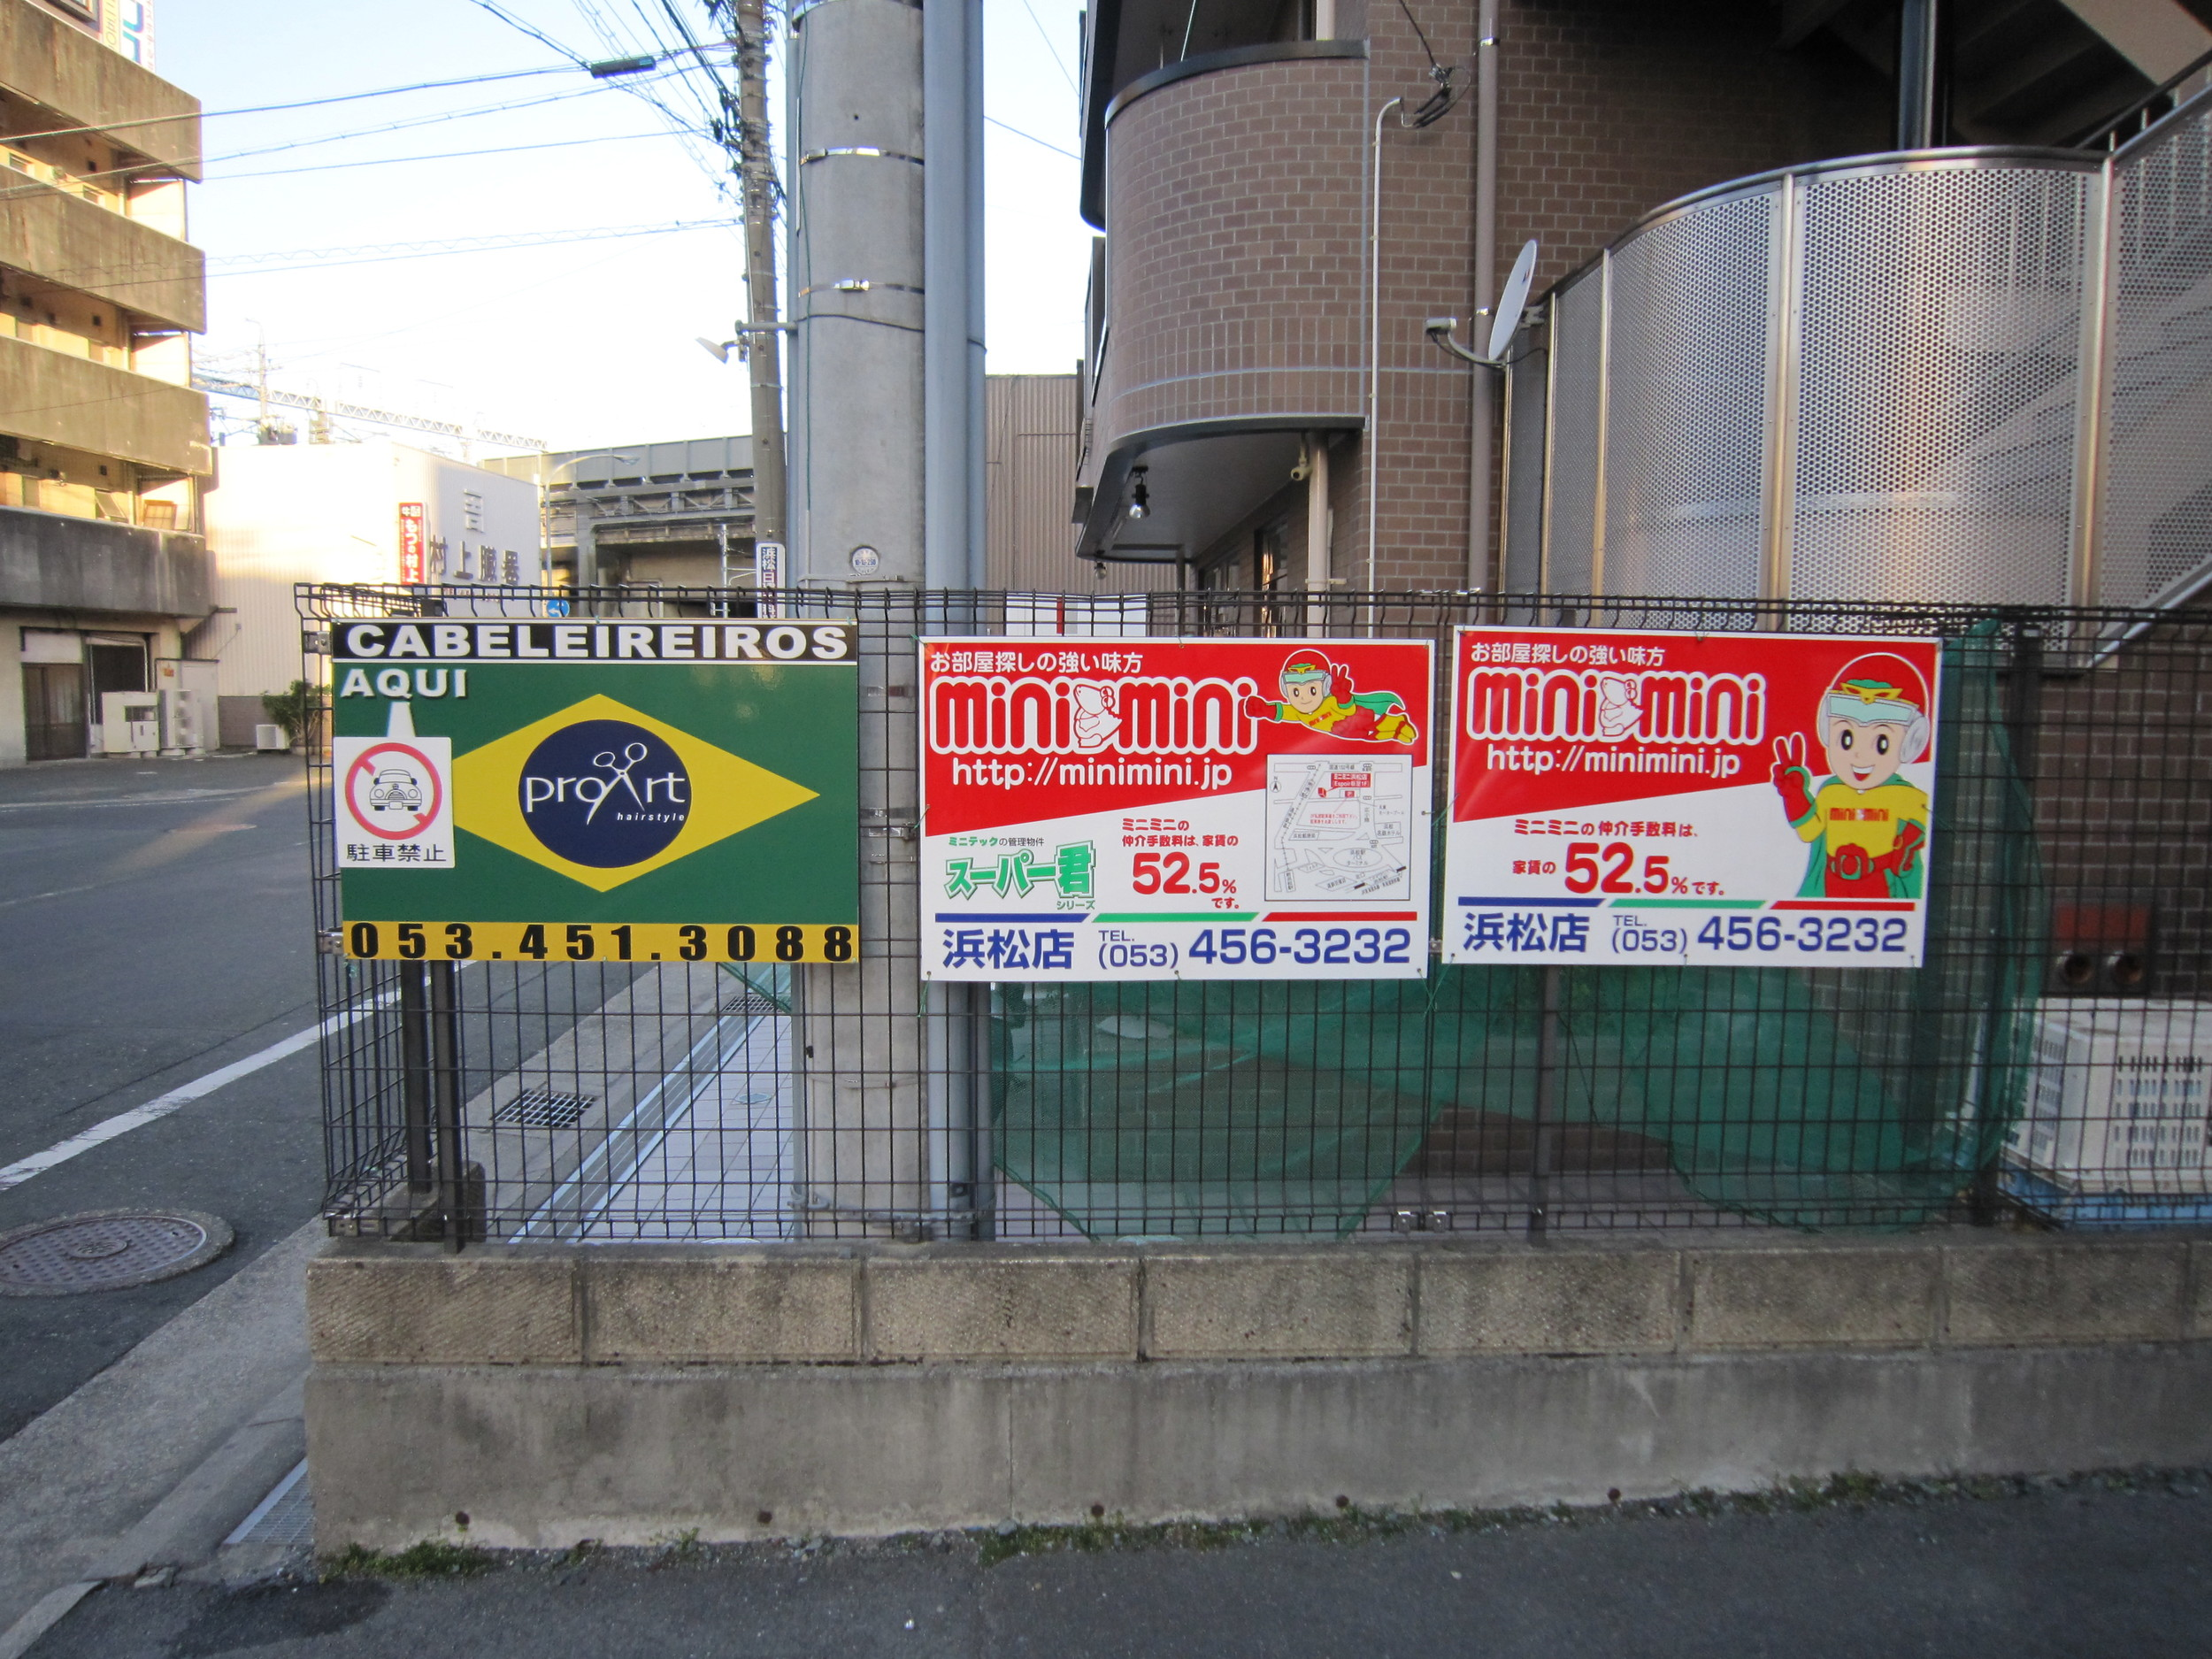 Brazilian sign